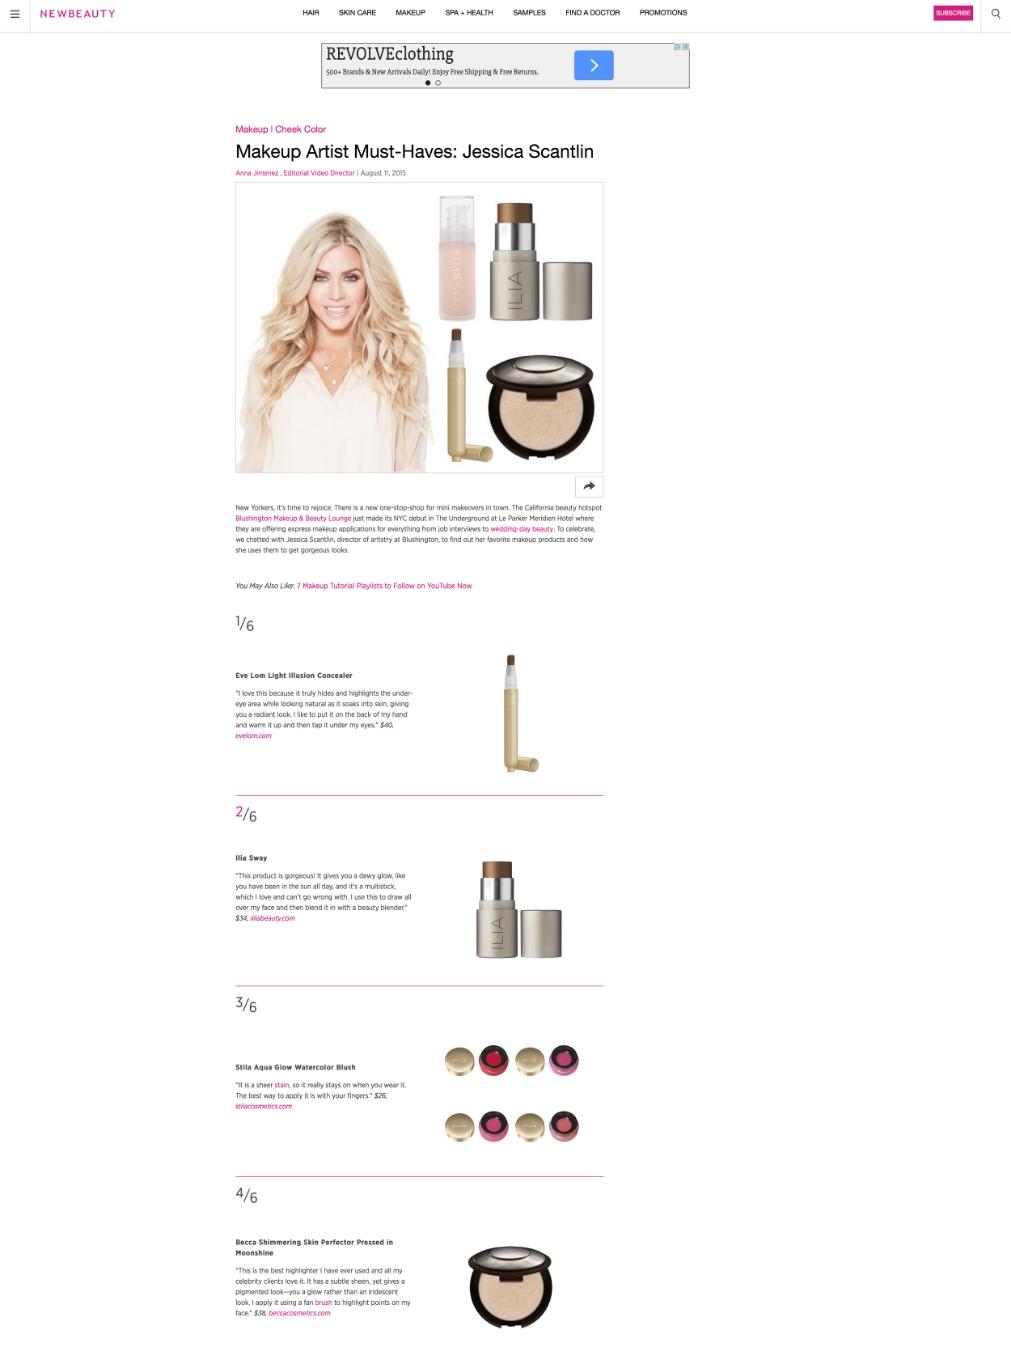 http---www.newbeauty.com-slideshow-1873-jessica-scantlin-beauty-recommendations-(20150905).jpg